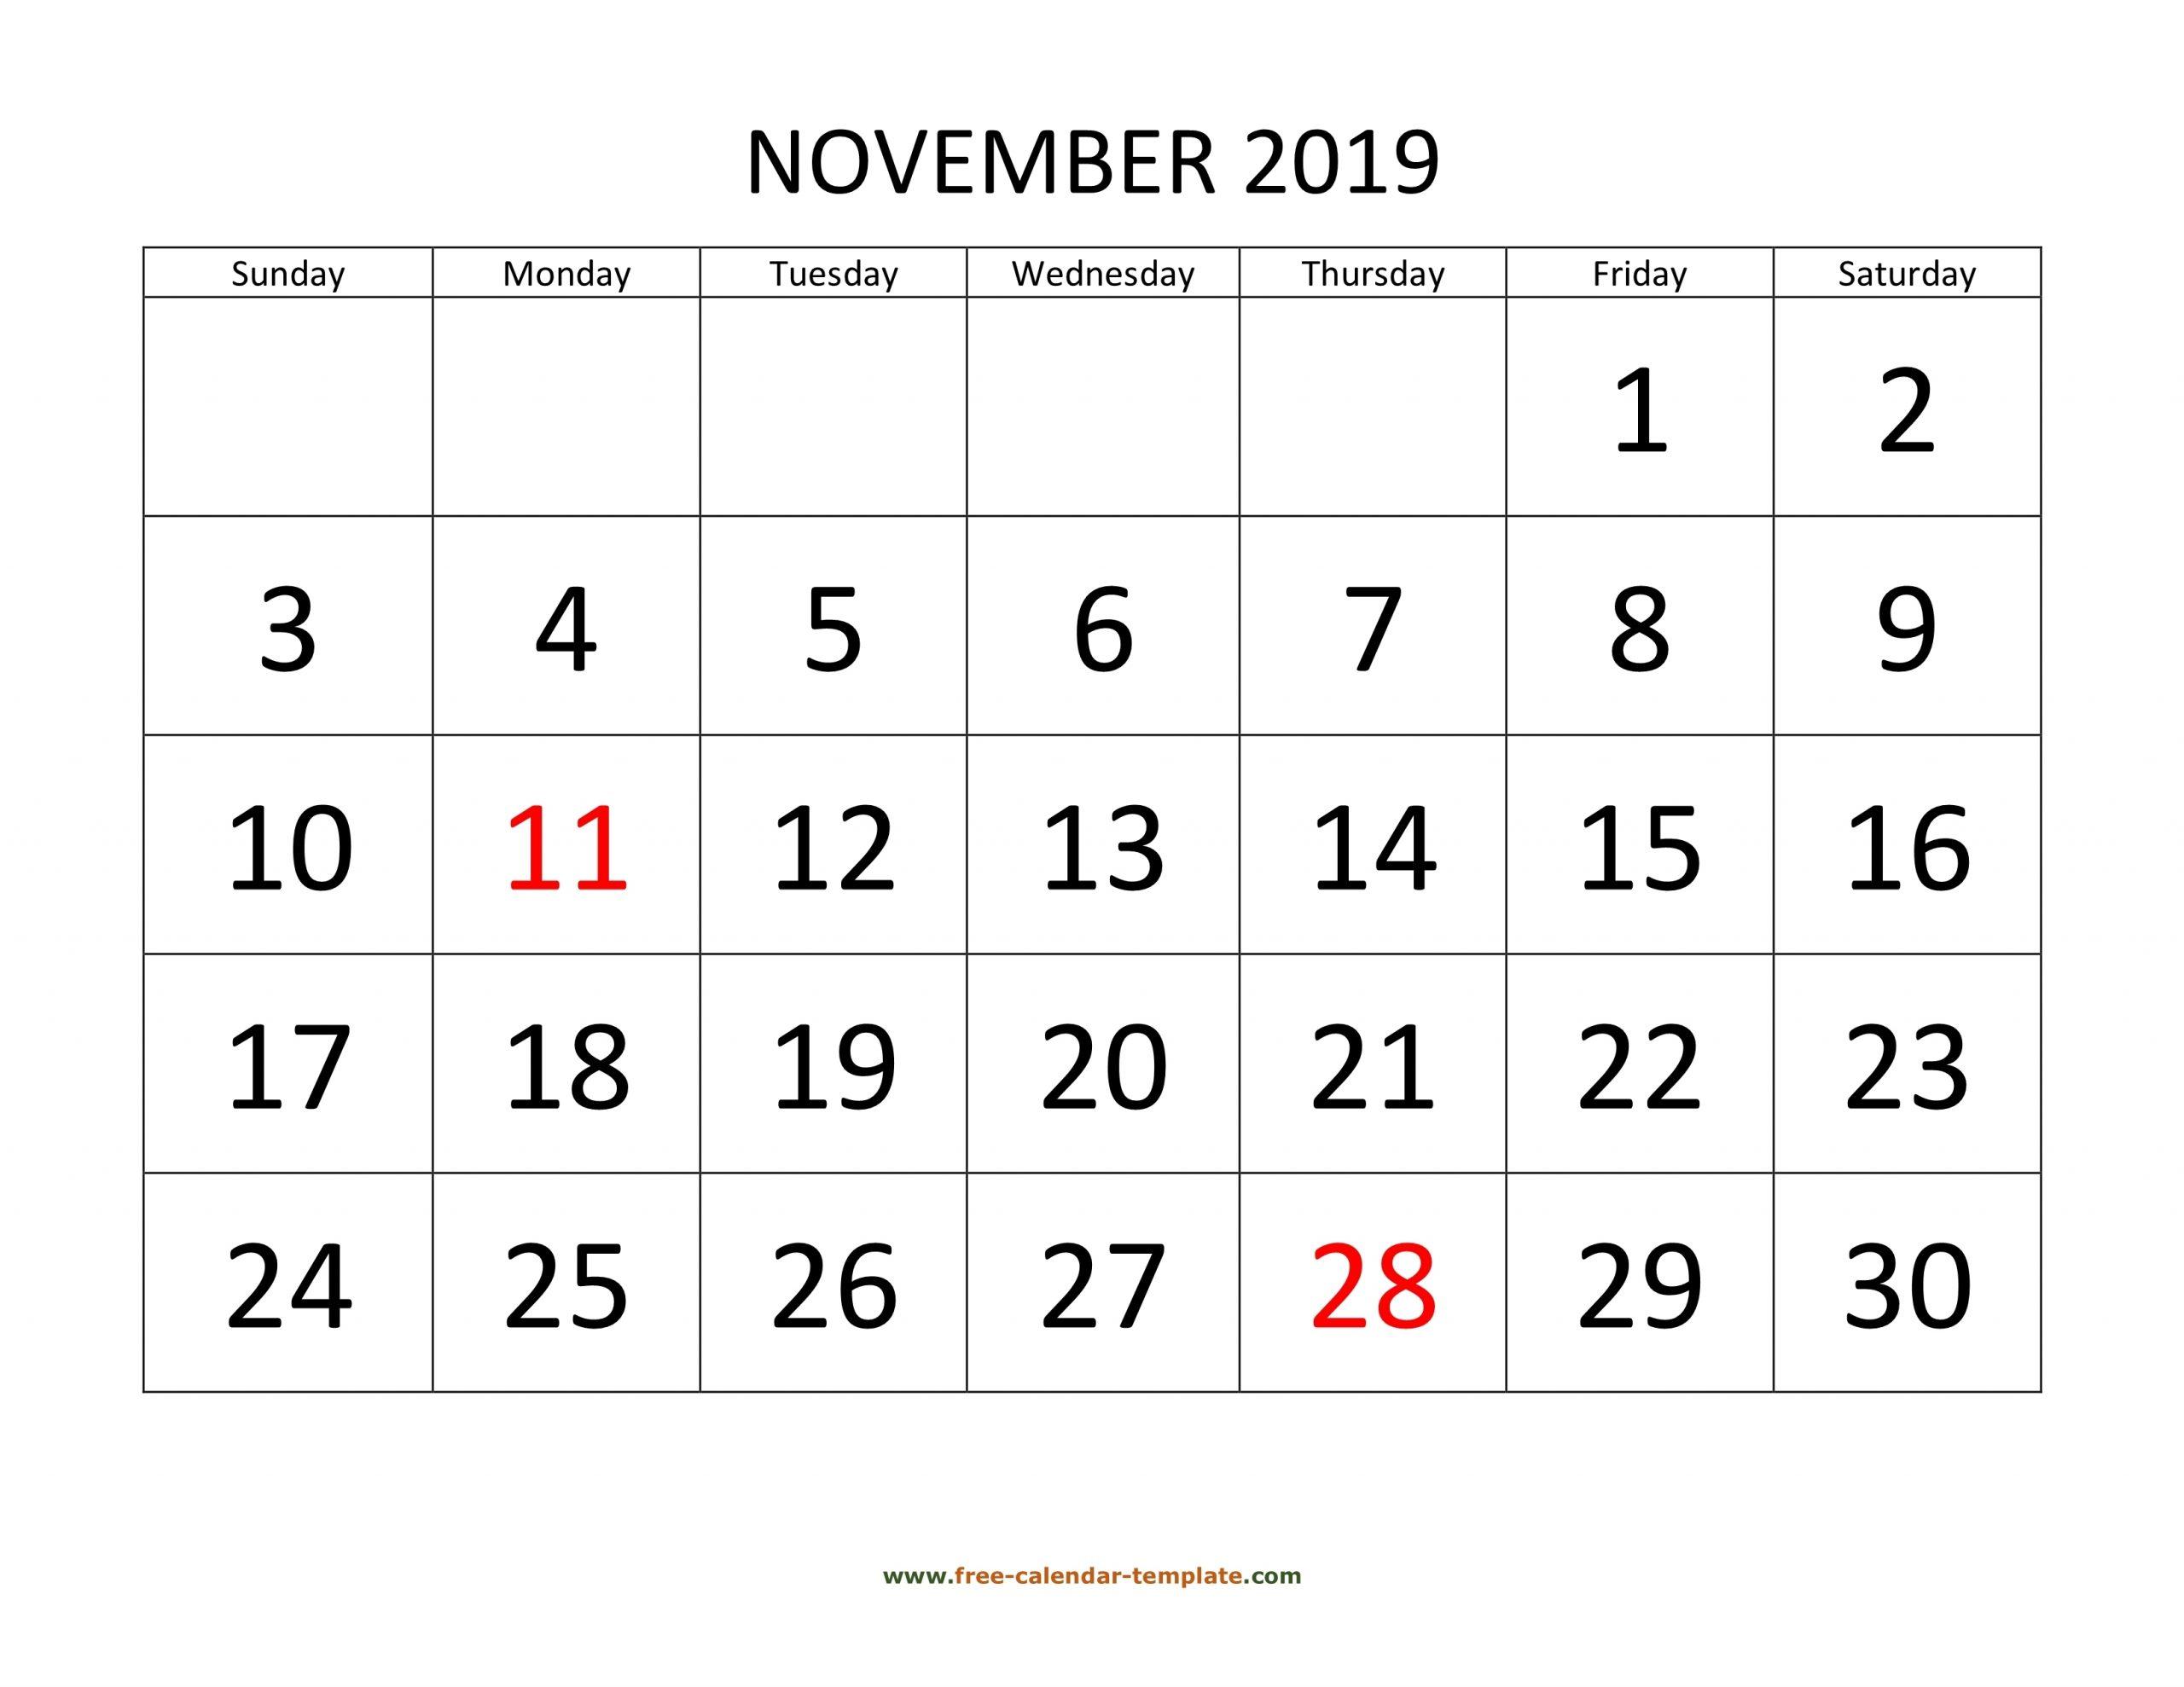 November 2019 Free Calendar Tempplate   Free-Calendar